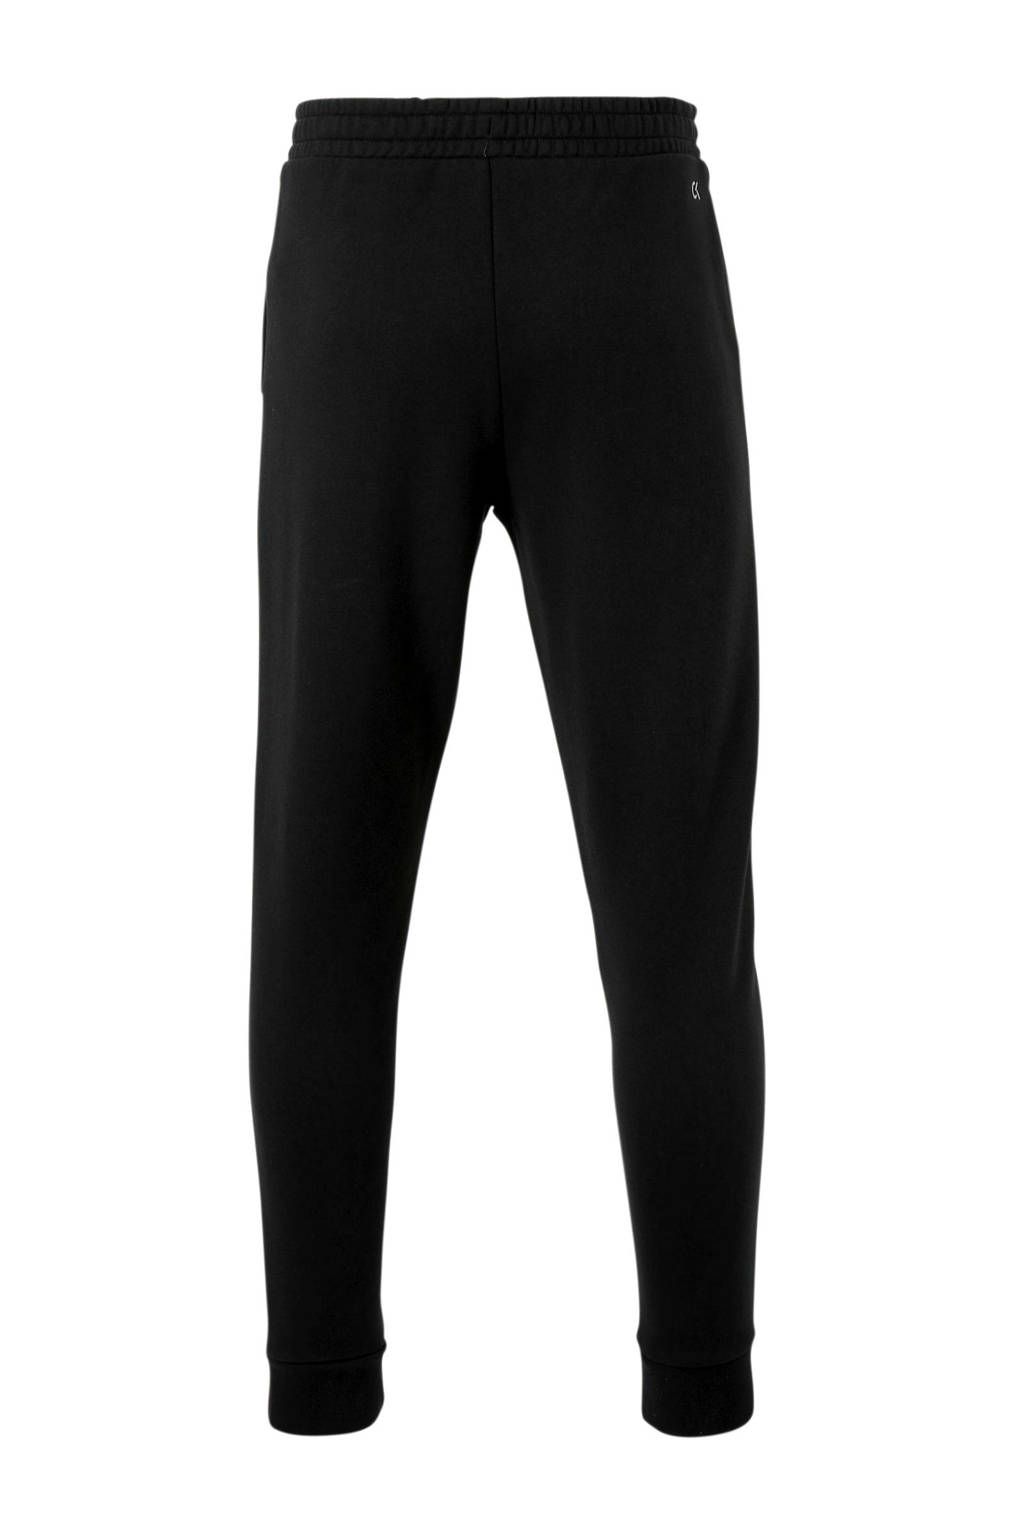 CALVIN KLEIN PERFORMANCE   joggingbroek zwart, Zwart